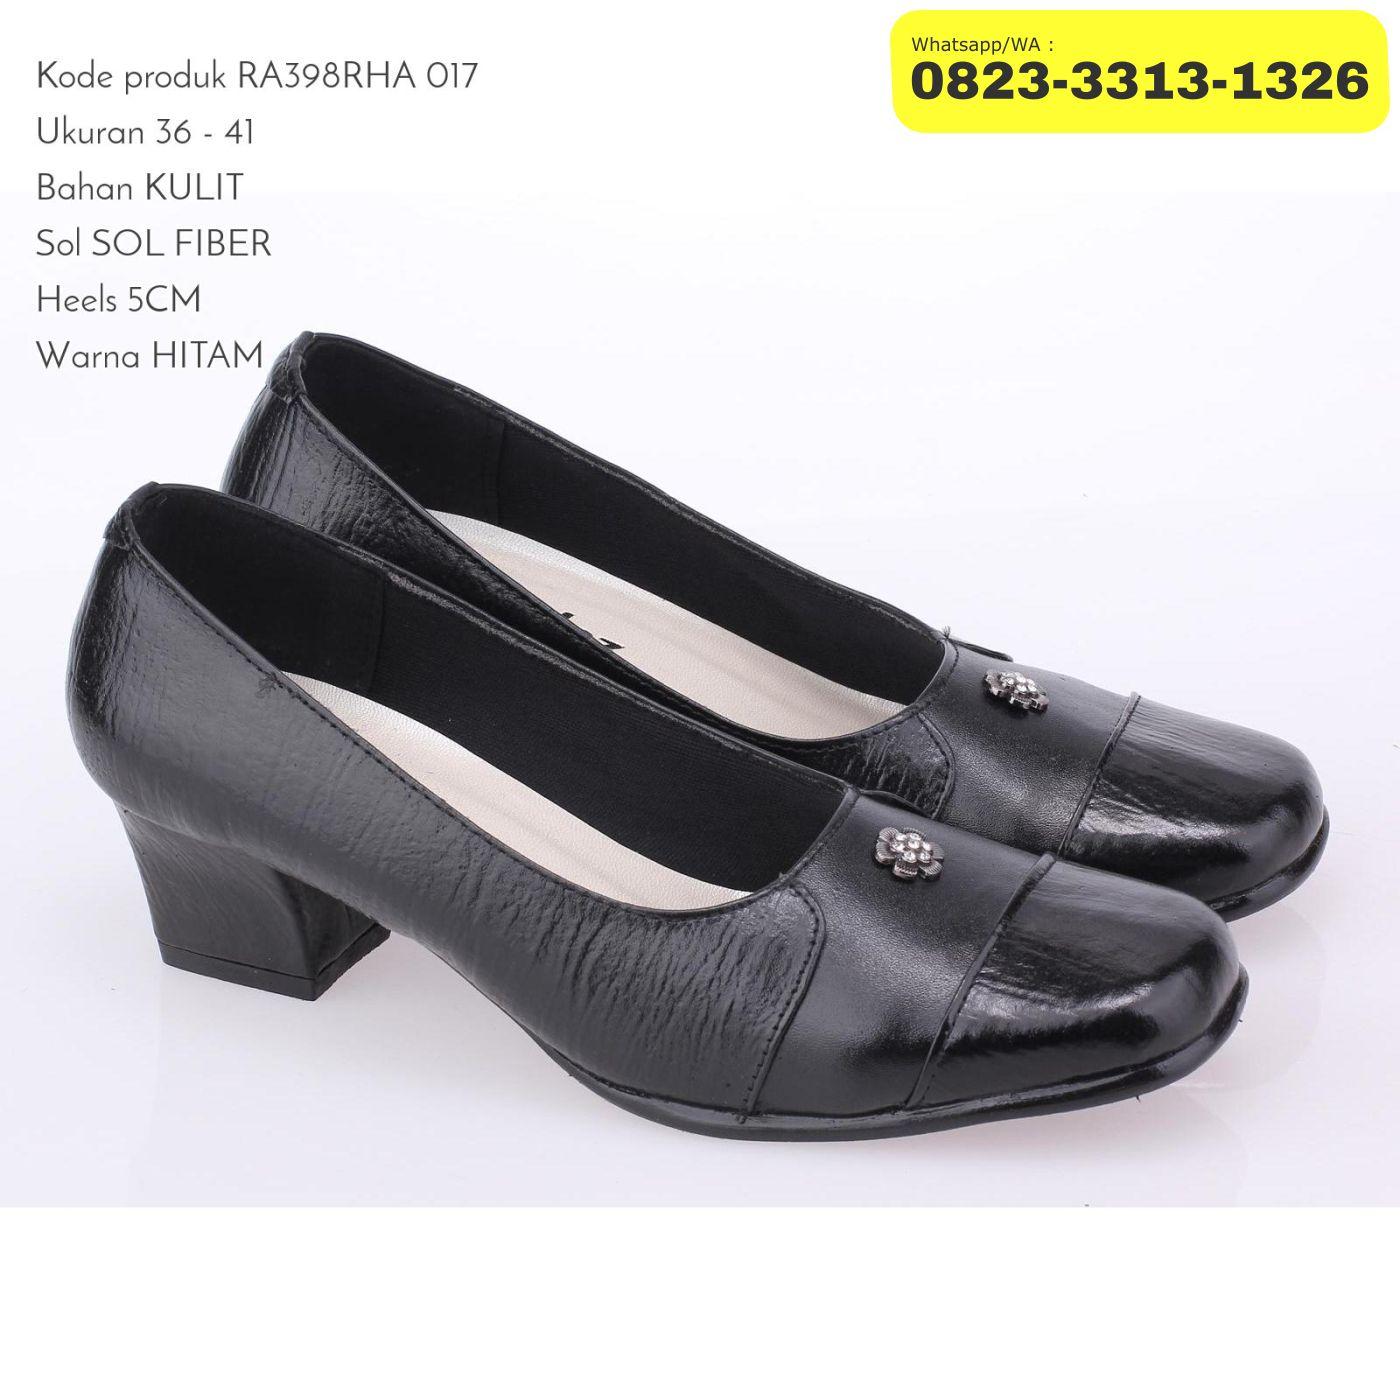 Sepatu Kerja Formal   Pantofel Wanita - RA398RHA 017 62e1901ba0